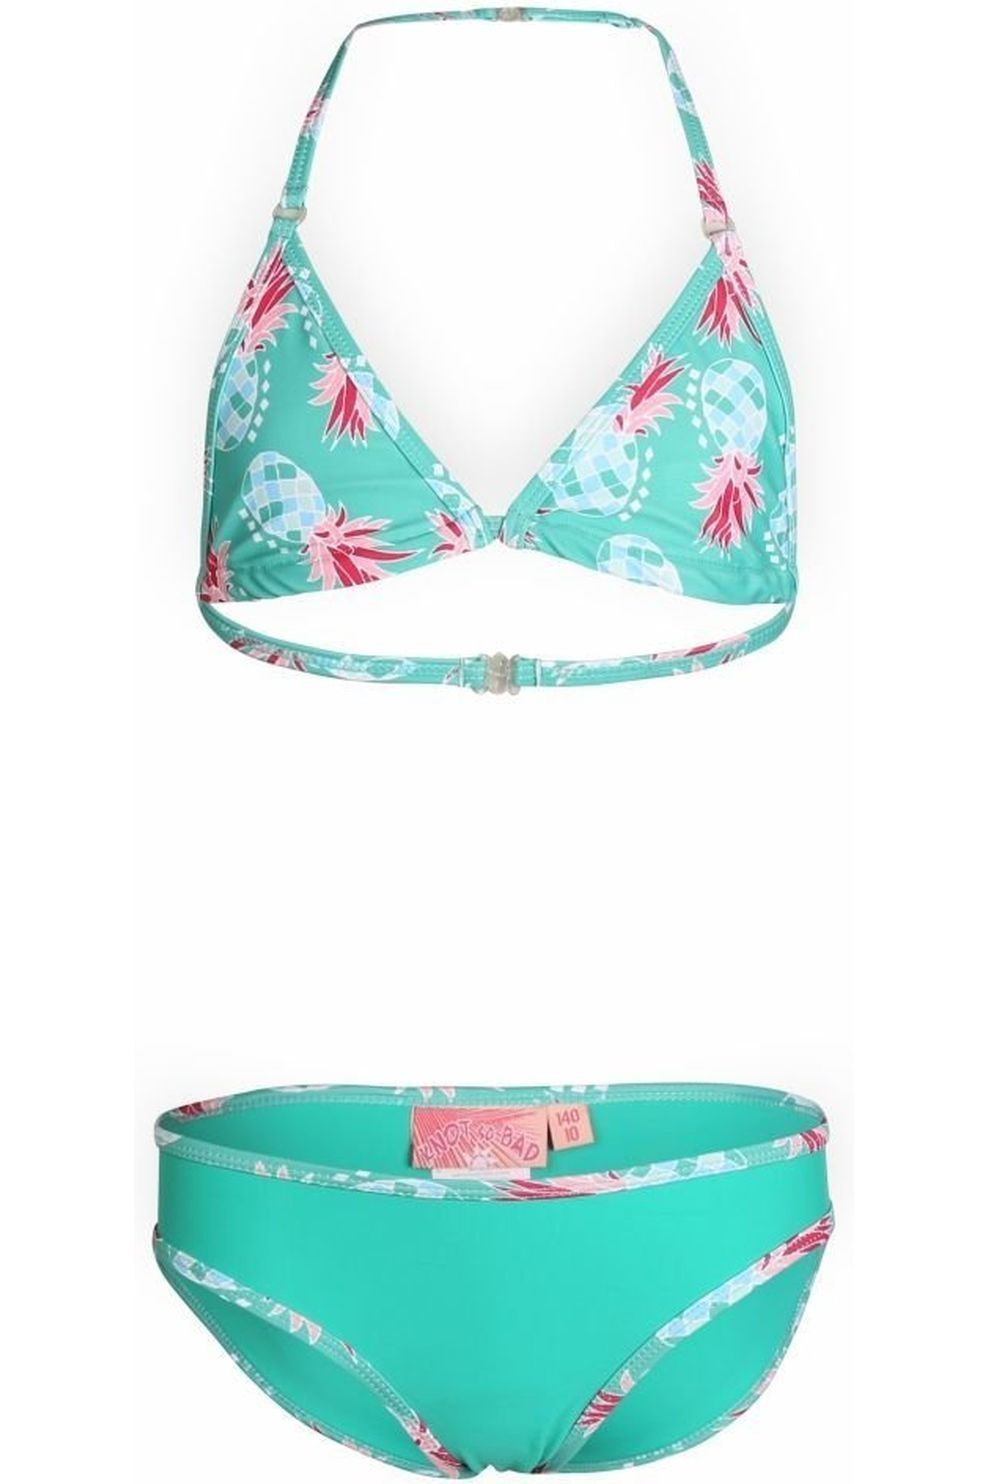 Knot so bad Bikini Ananas voor meisjes - Groen/ Gemengd - Maat: 104